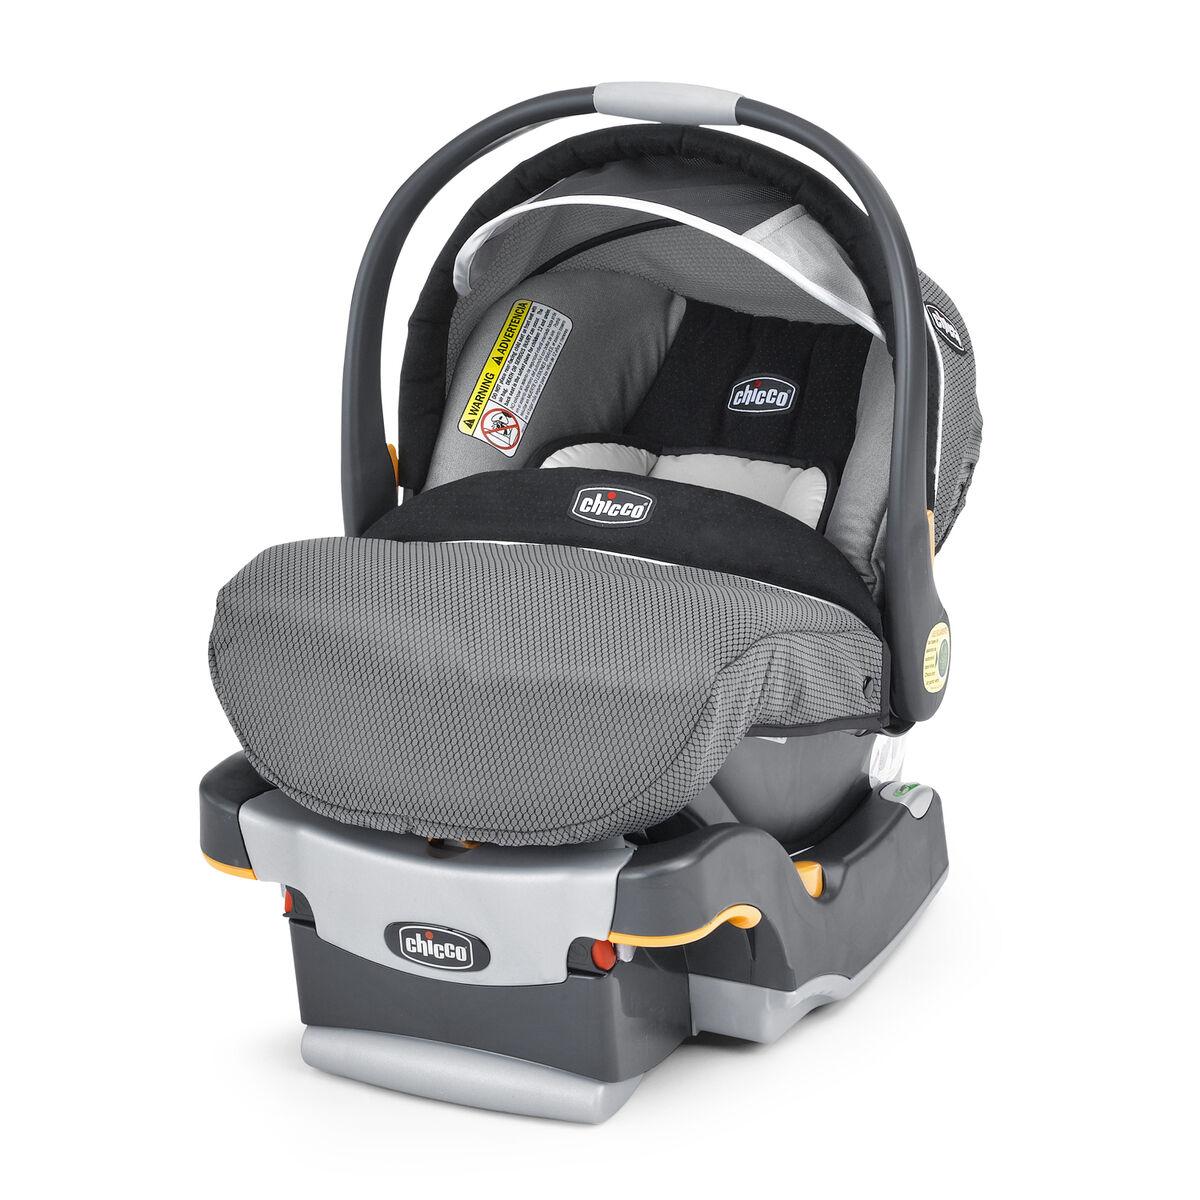 Keyfit 30 infant car seat base graphicakeyfit 30 infant car seat and base graphica